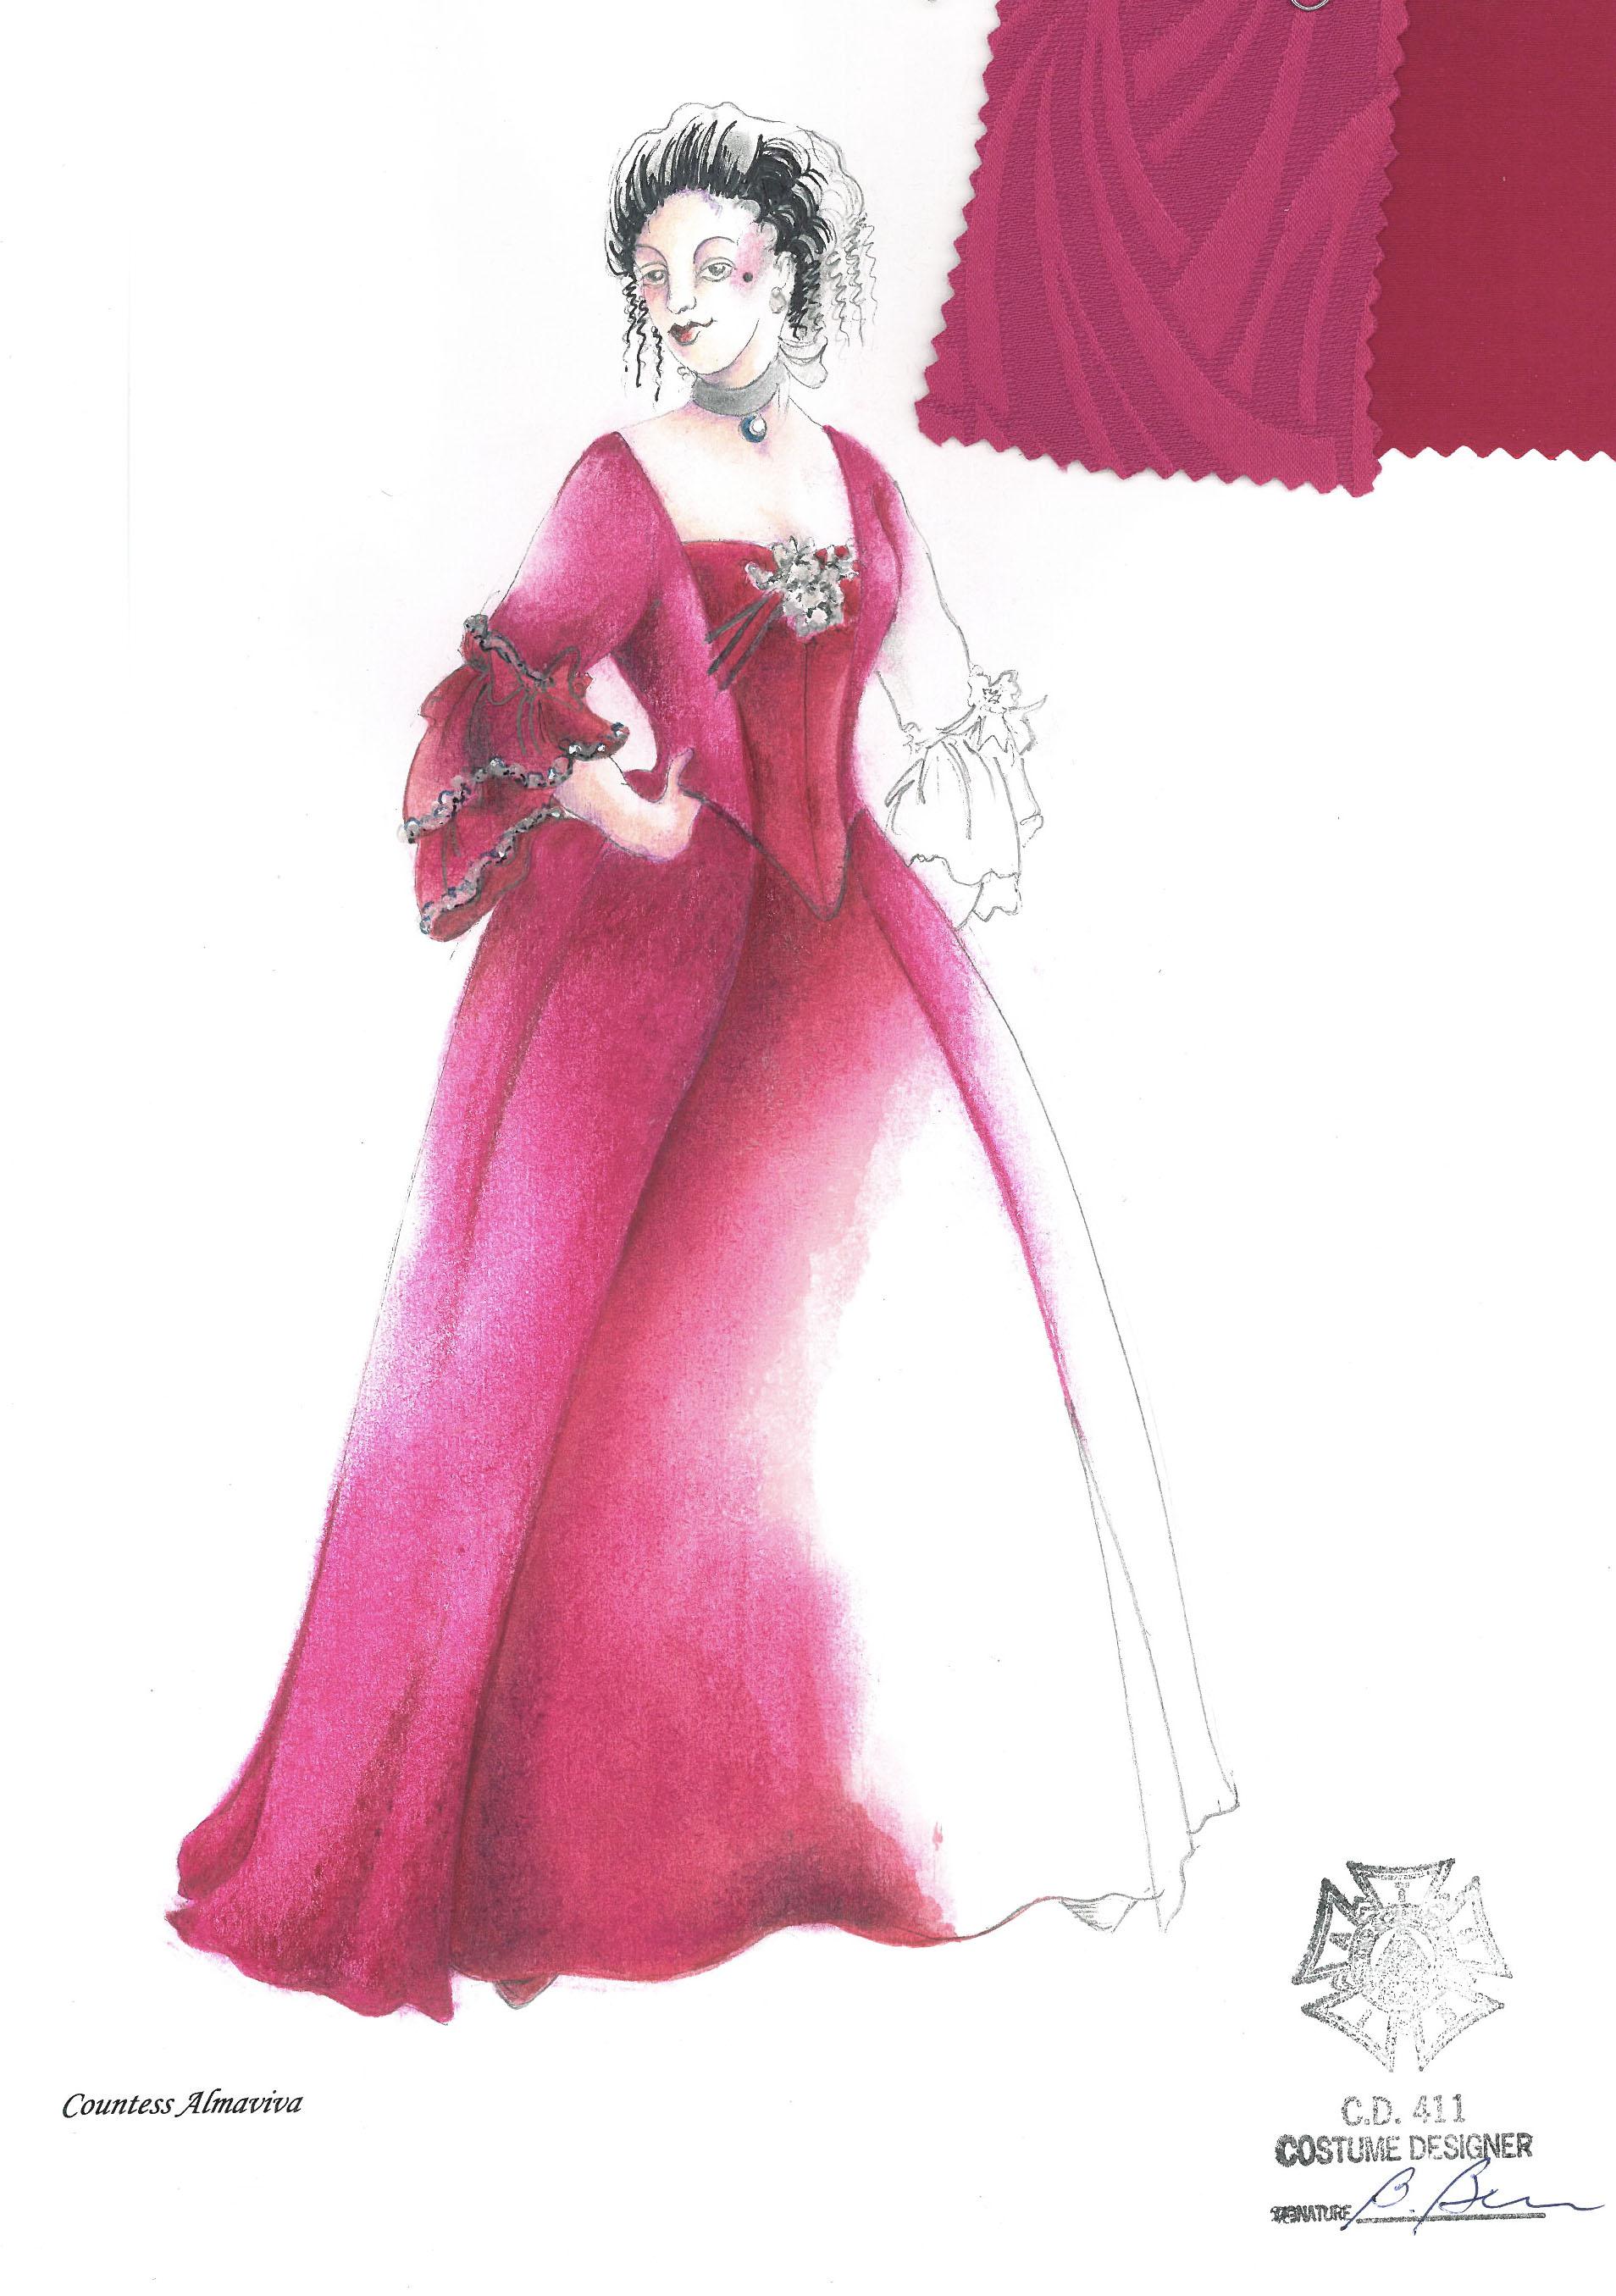 Countess.jpg